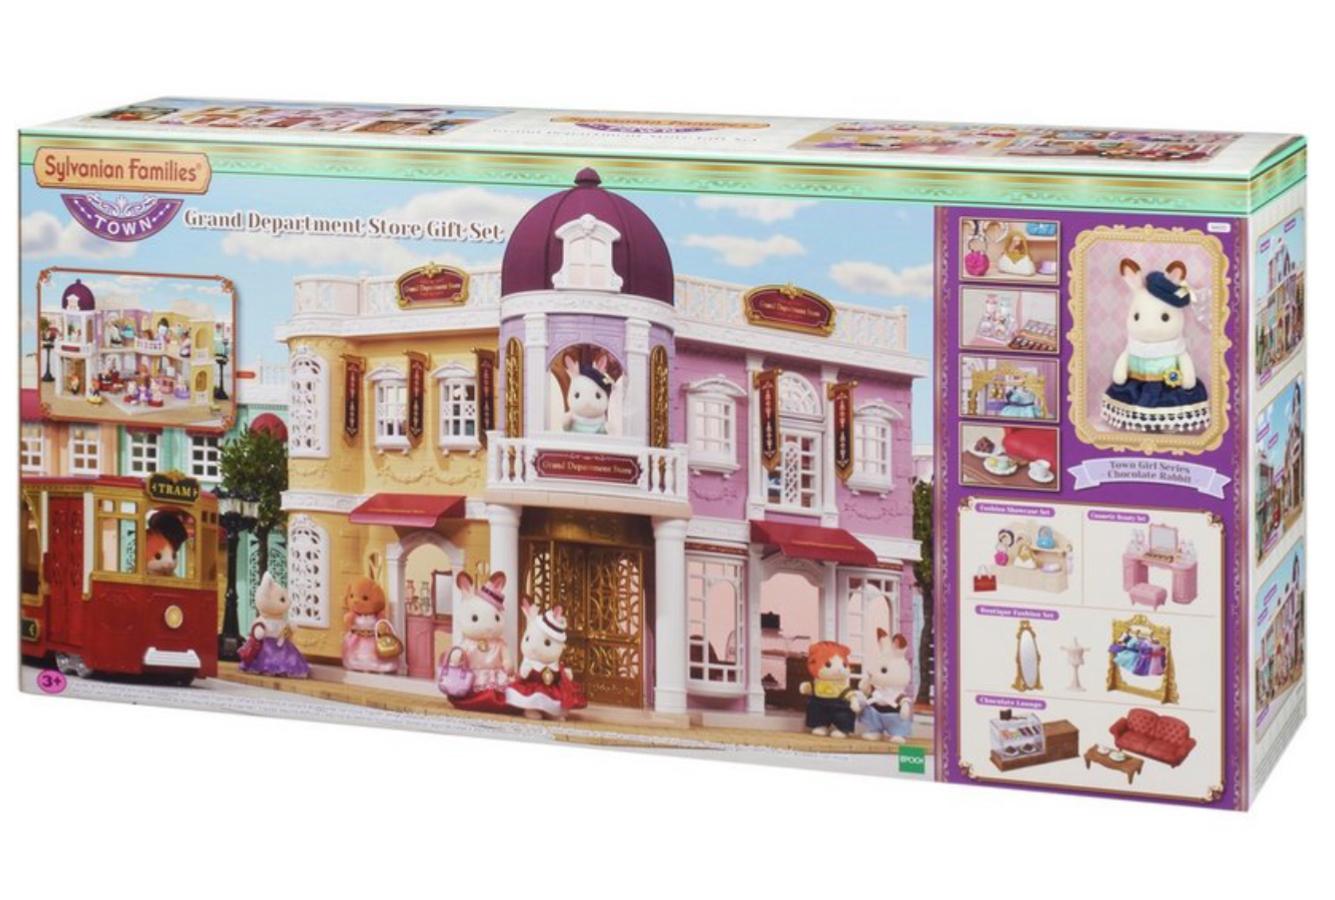 Sylvanian Families Department Store Gift Set @ Argos - £55.99